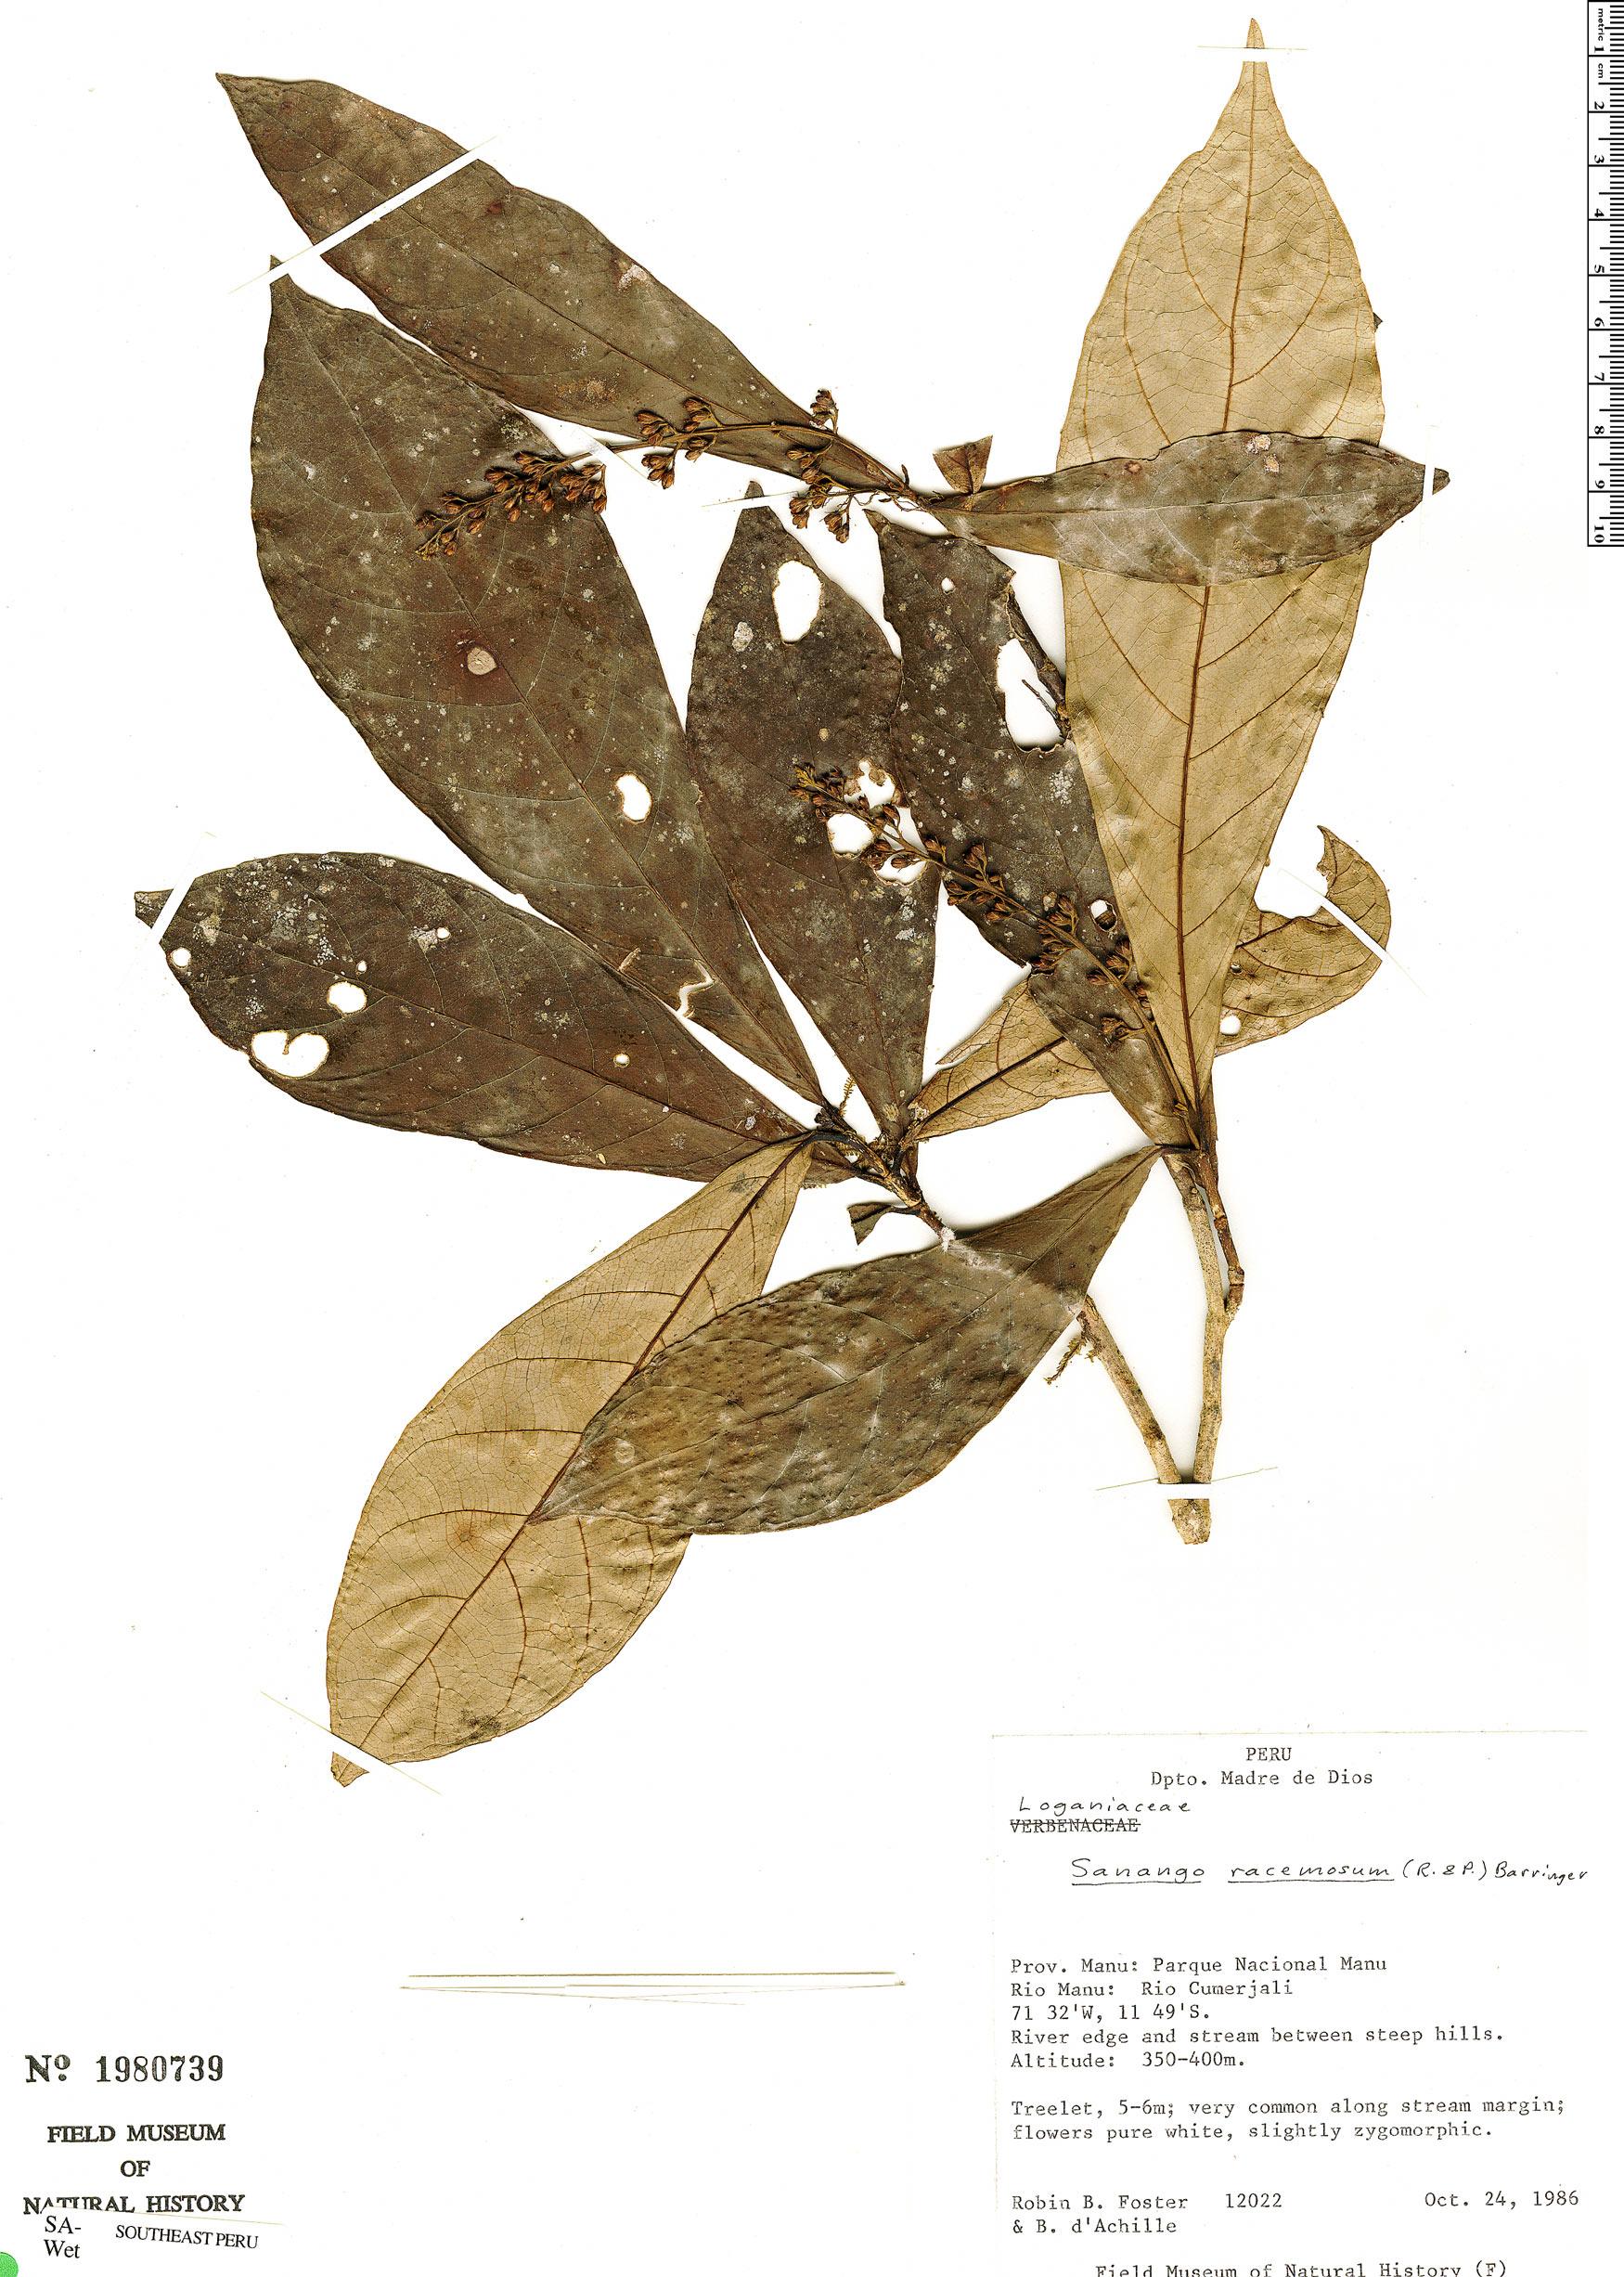 Specimen: Sanango racemosum